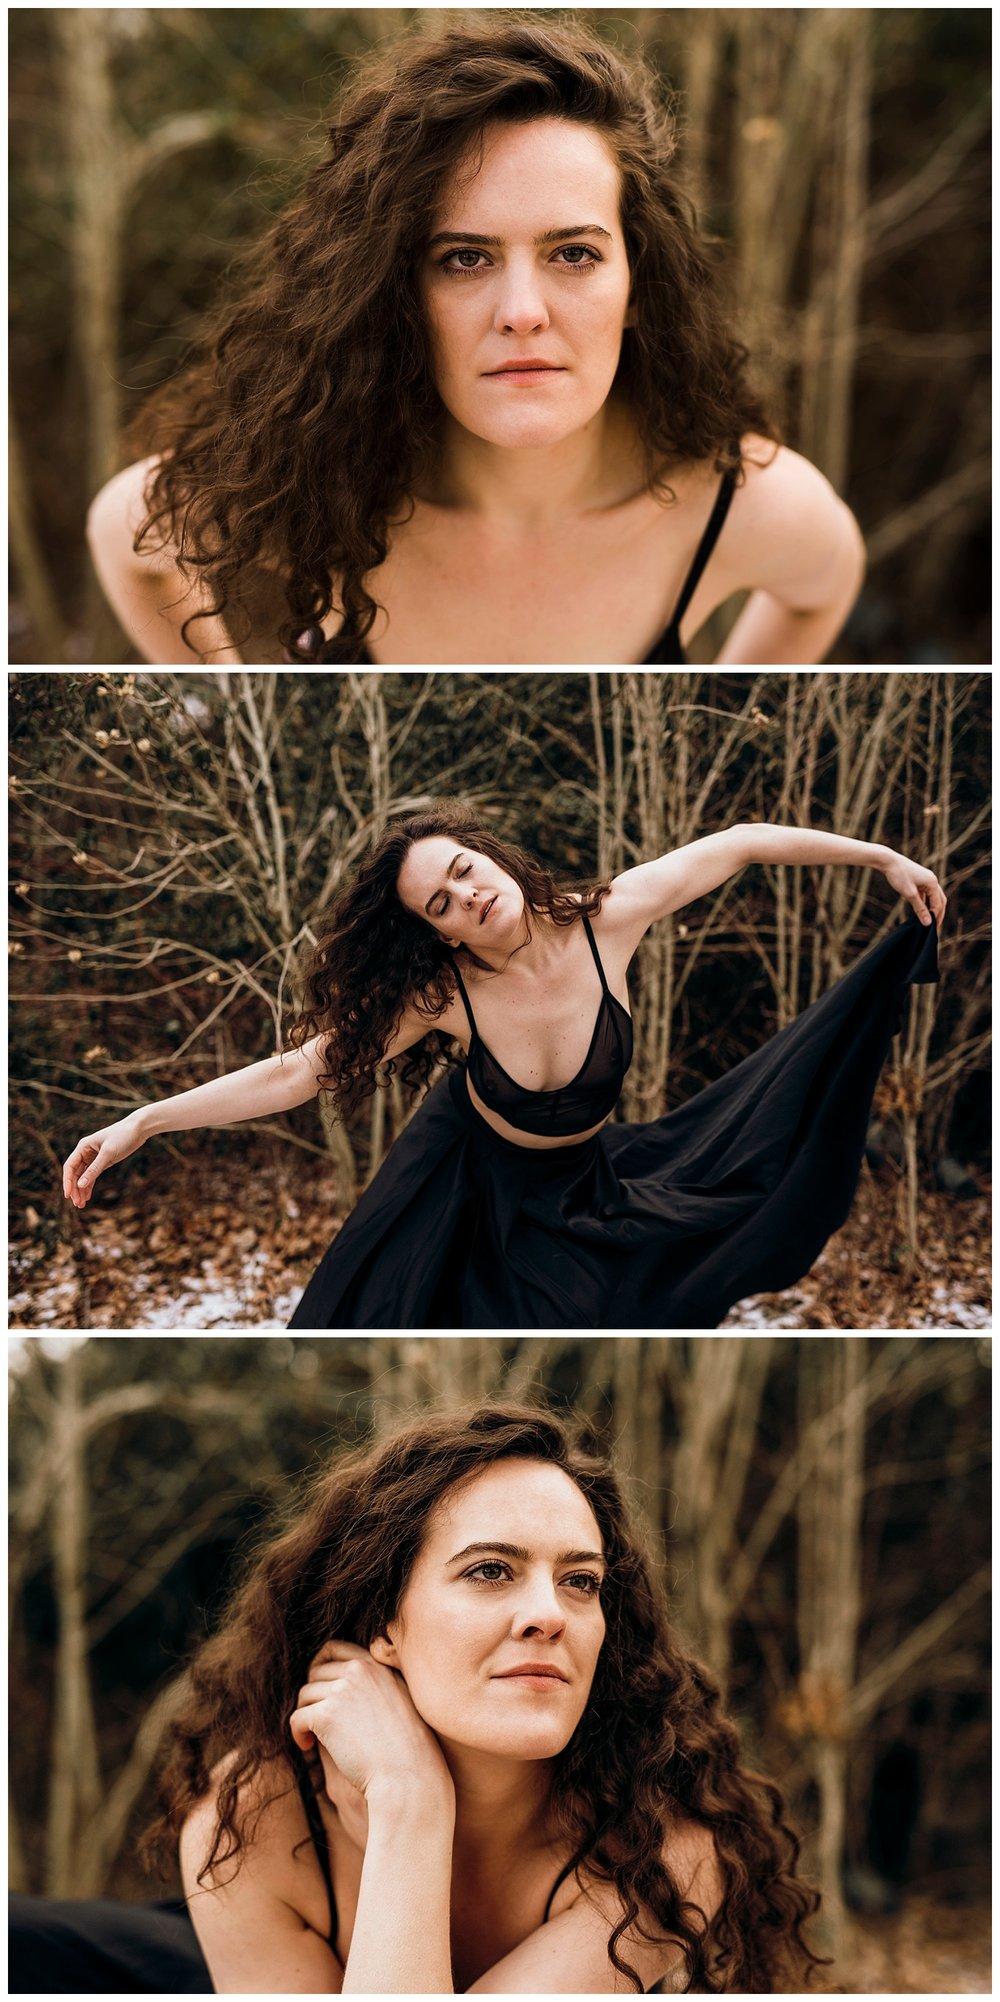 Dancer_Portraits_NYC_Drama_Headshots_Theatre_Photography_Apollo_Fields_14.jpg